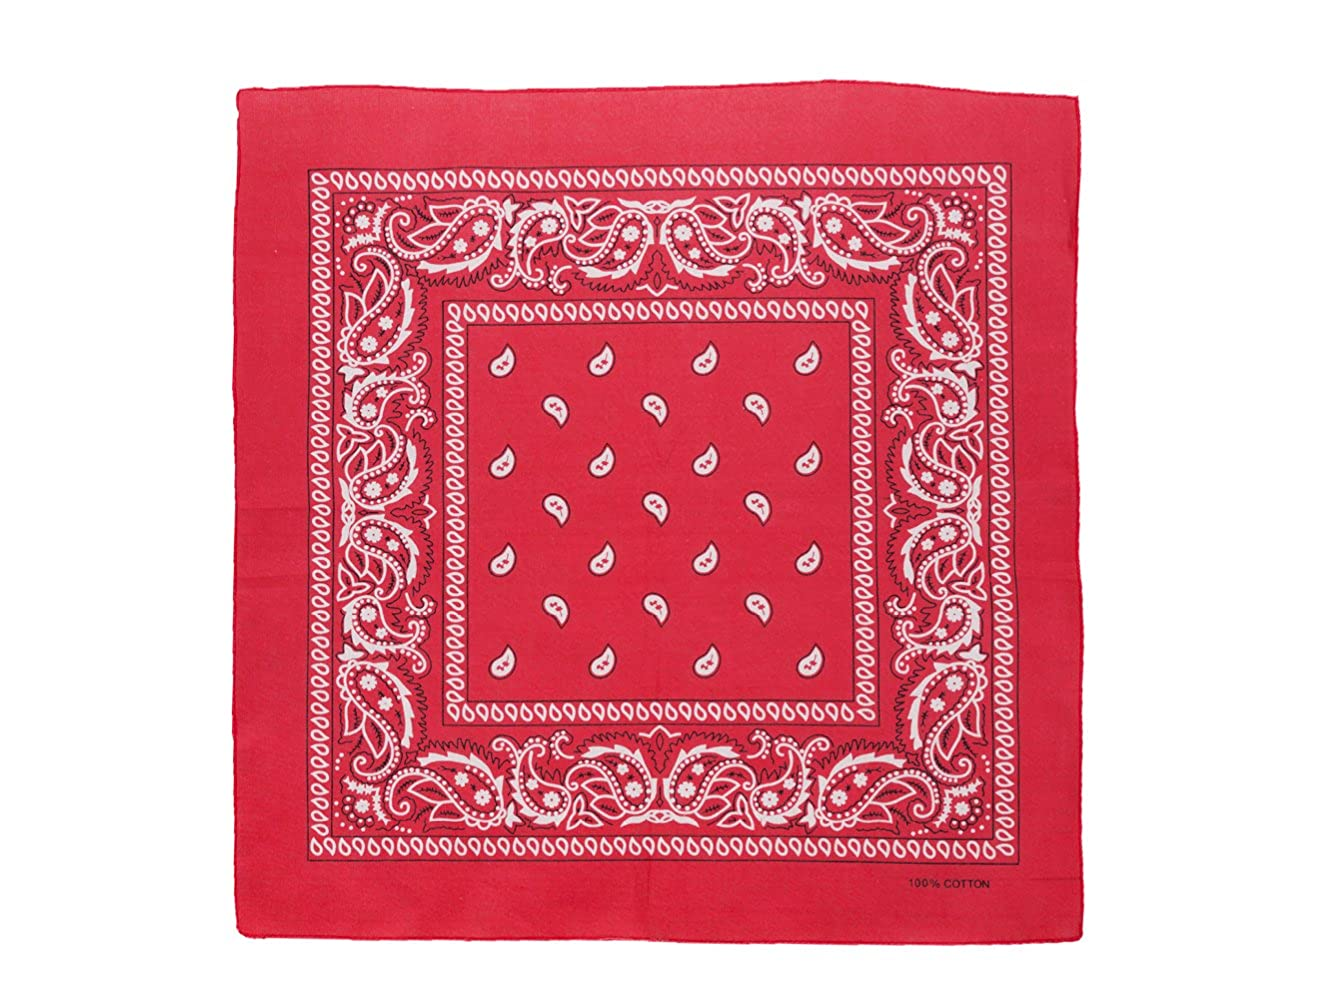 Bandana Kopftuch Tuch 100/% Baumwolle Halstuch Nickituch Paisley  Light Pink